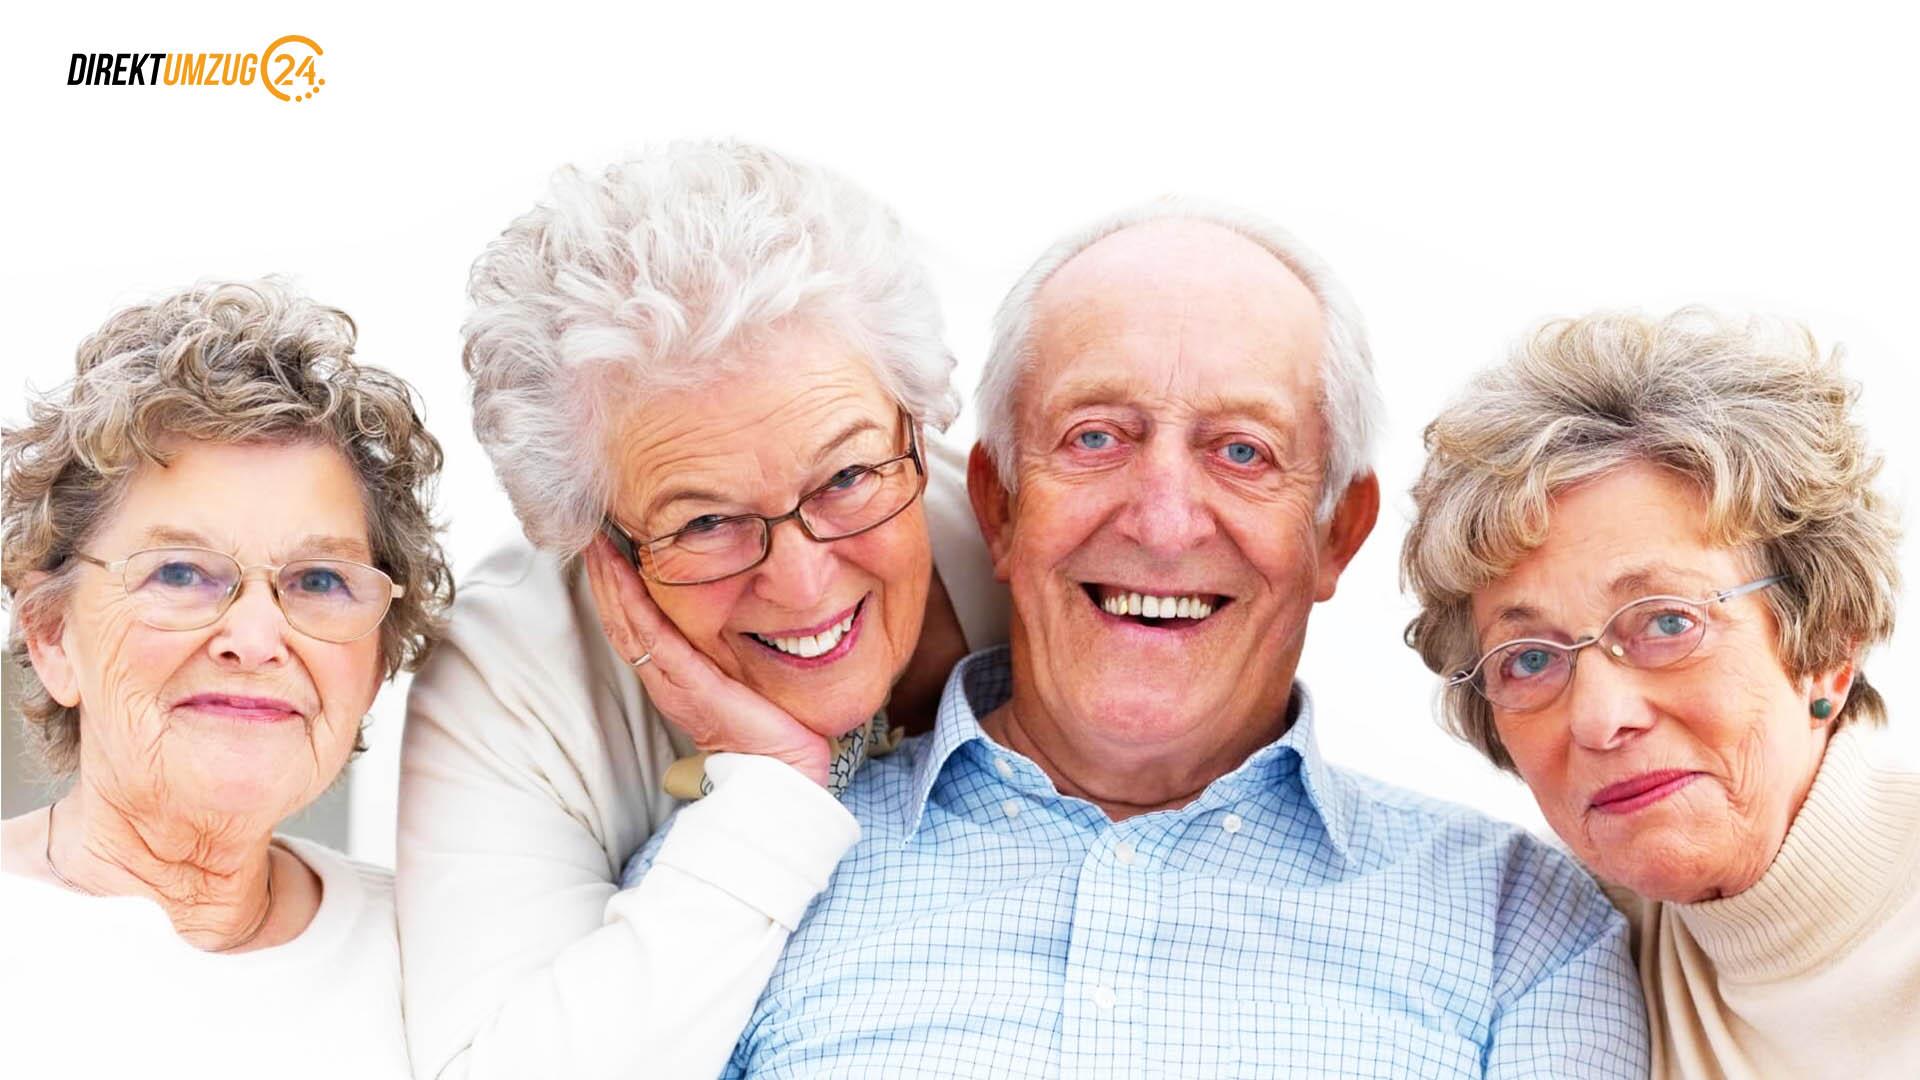 Seniorenumzug mit Direktumzug24